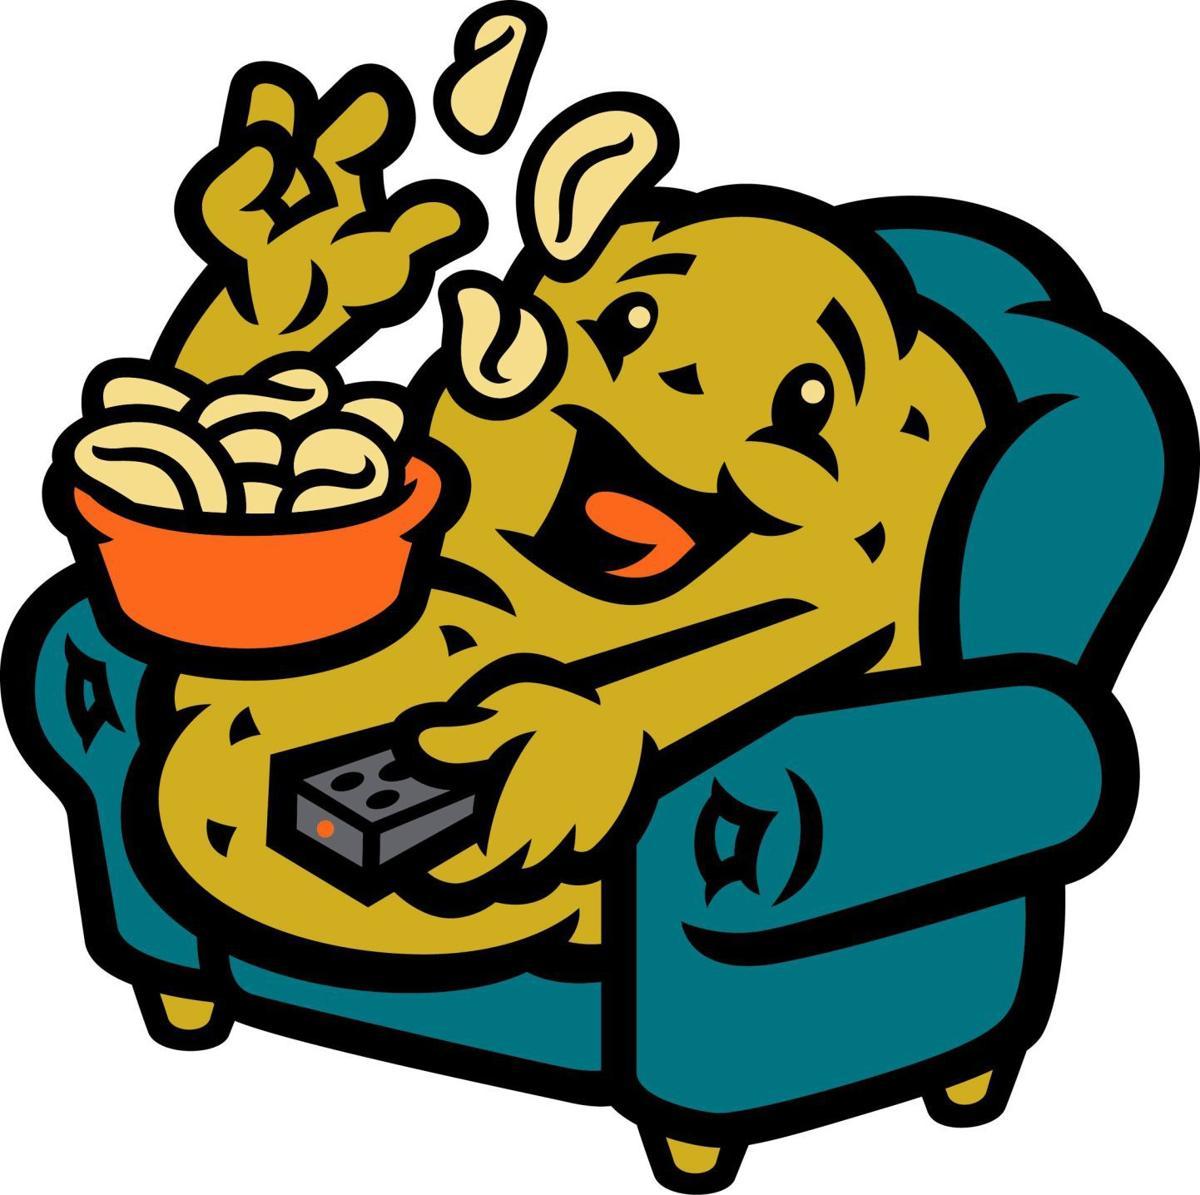 Couch Potato Logo